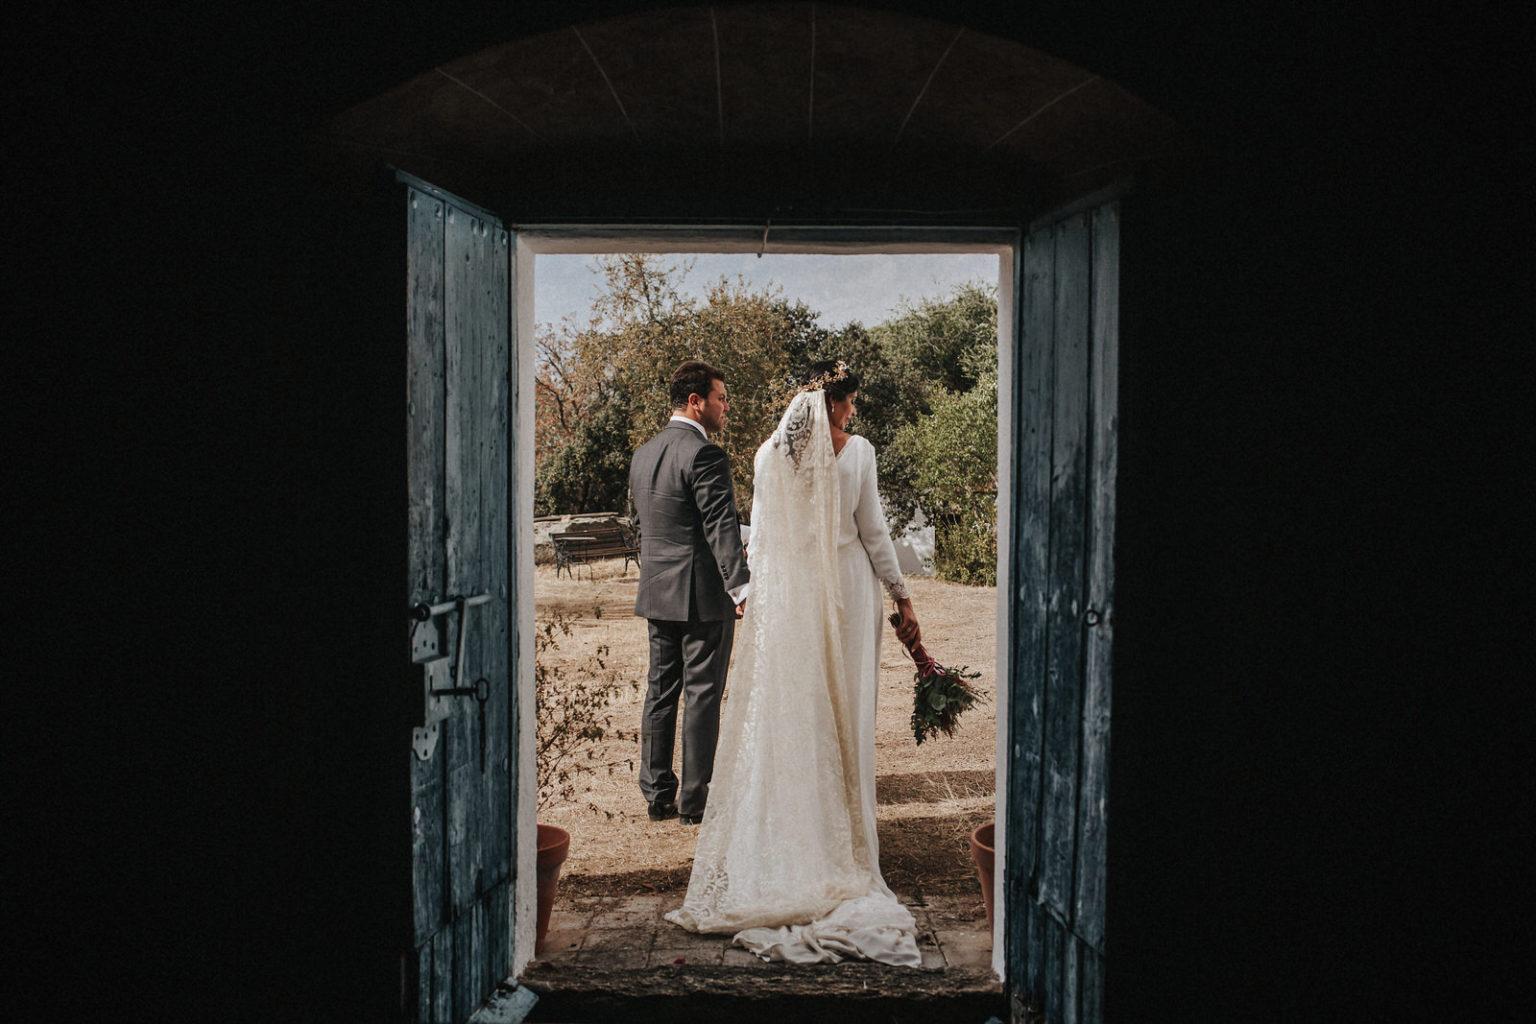 Reportaje de boda intimo, diferente, natural. Boda Extremadura